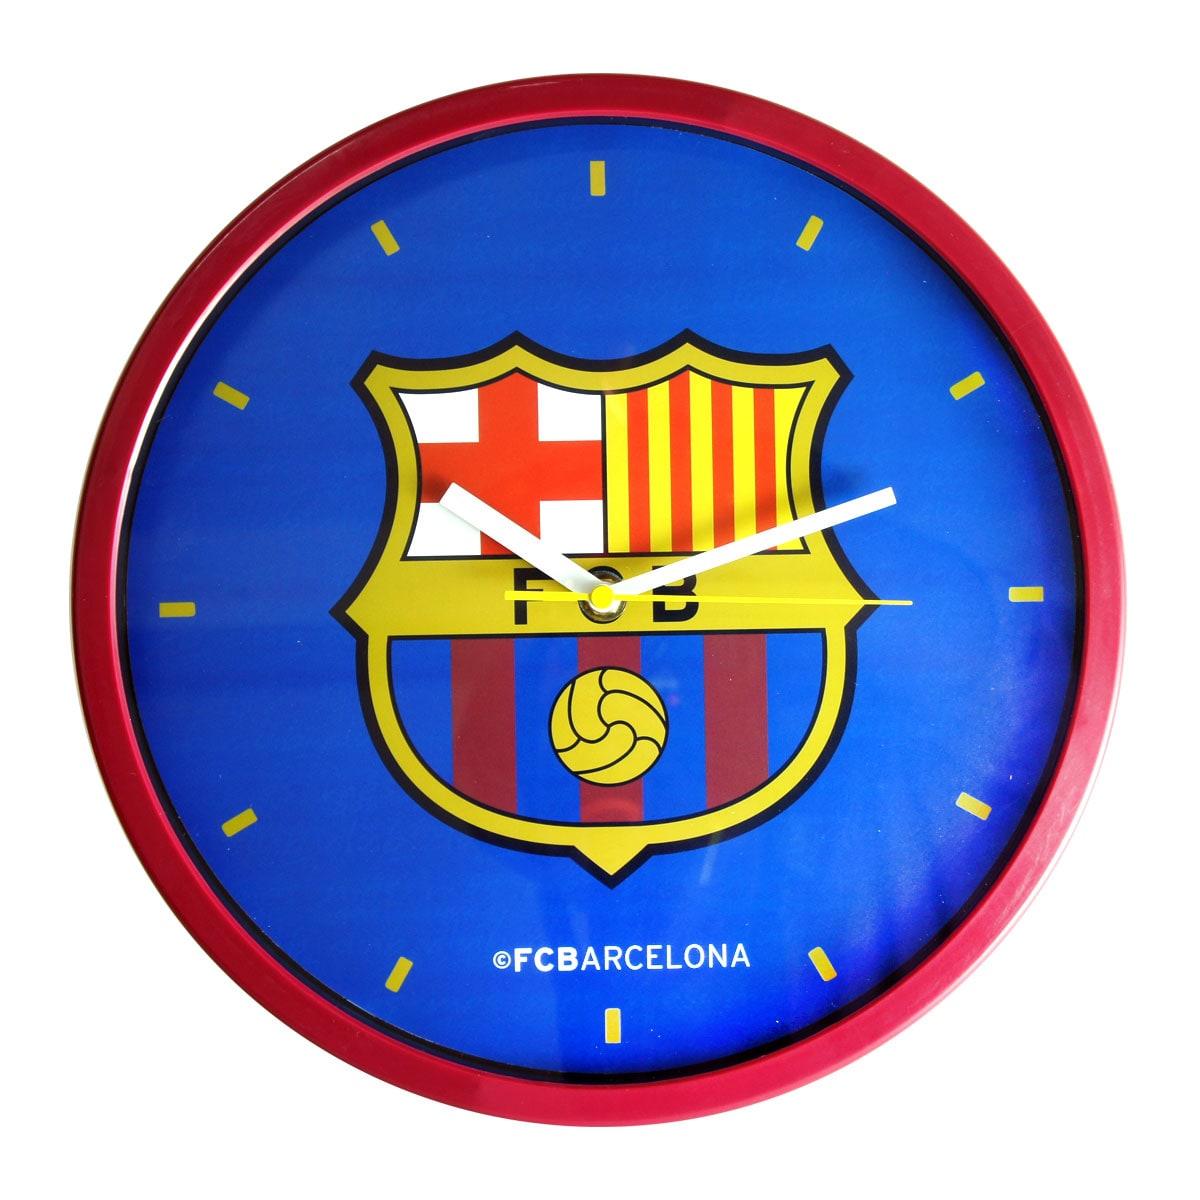 F.C. Barcelona Wall Clock - 1